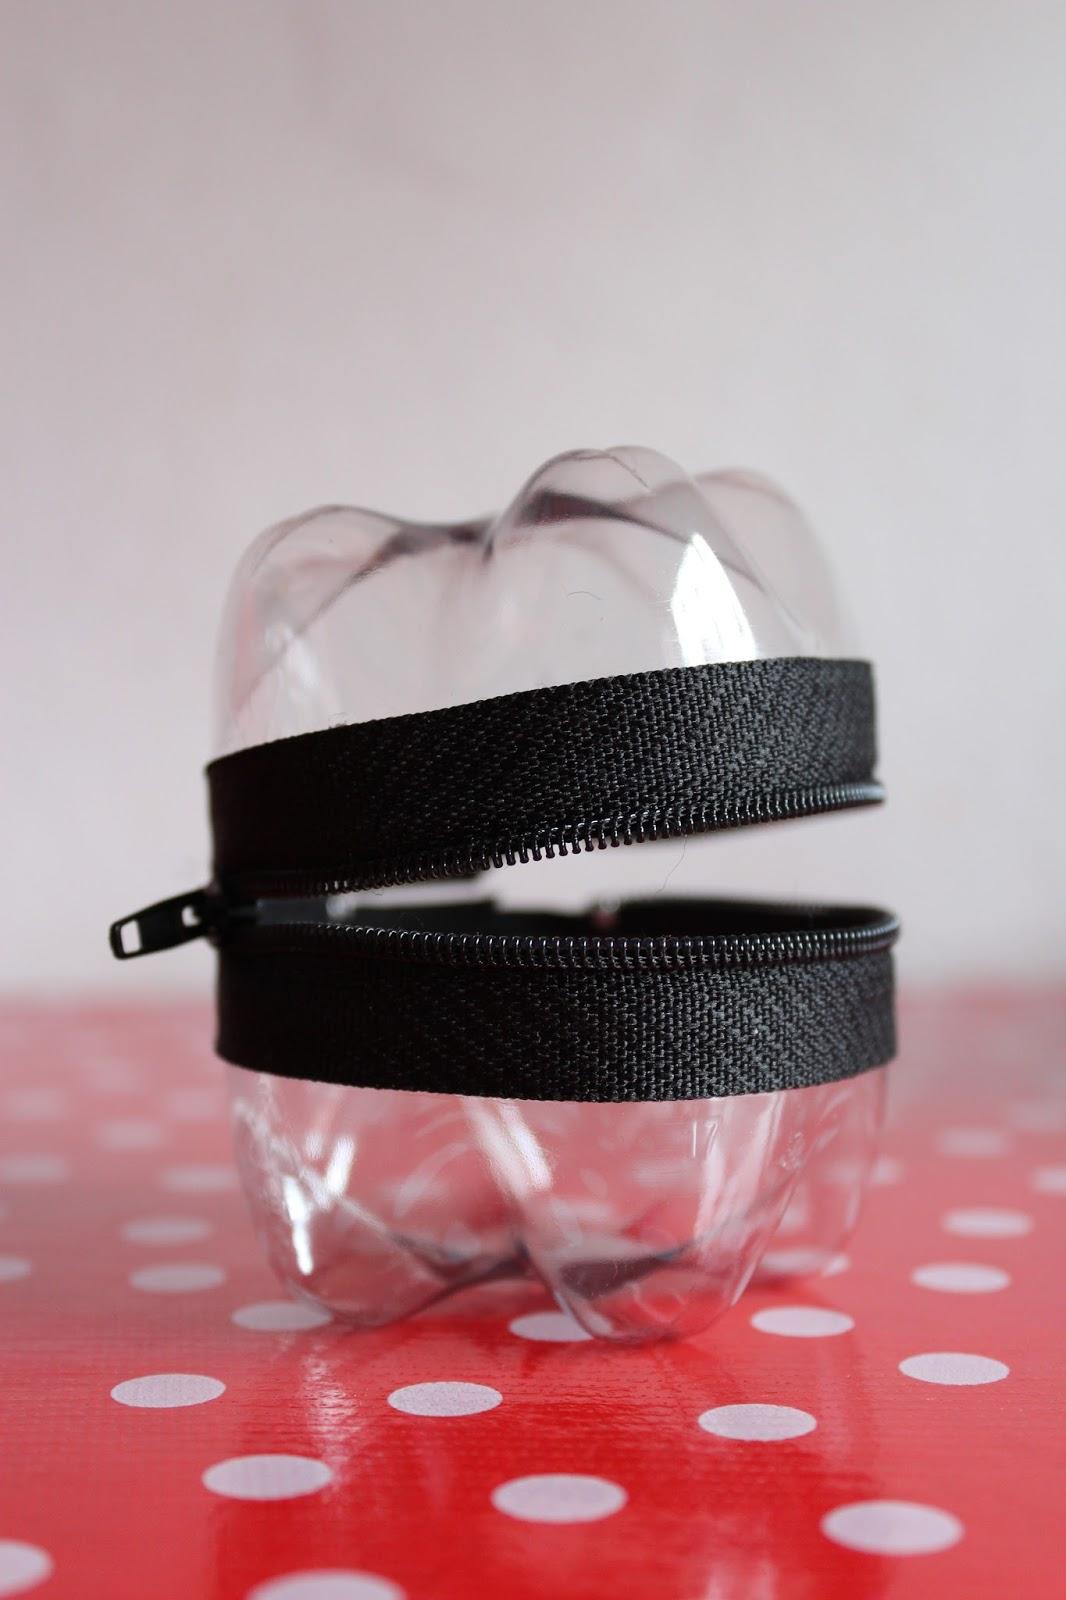 diy pet flaschen upcycling ars vera e diy blog f r. Black Bedroom Furniture Sets. Home Design Ideas